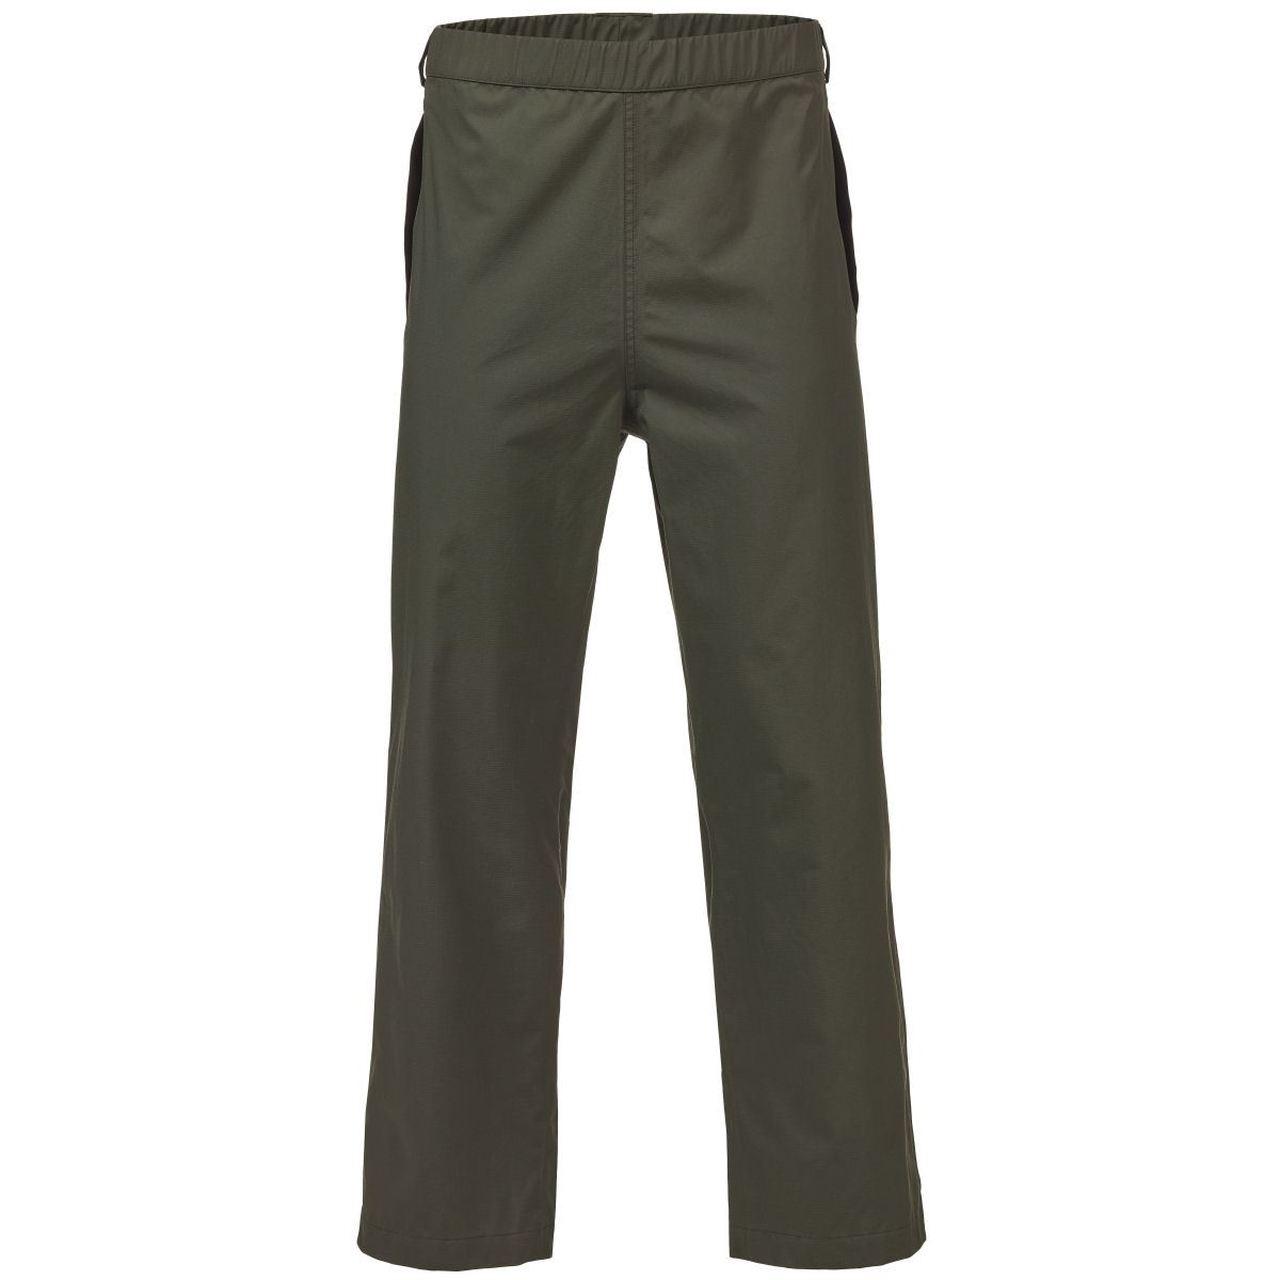 Musto-Fenland-BR2-Half-Lined-Packaway-Leggings-Unisex-Dark-Moss